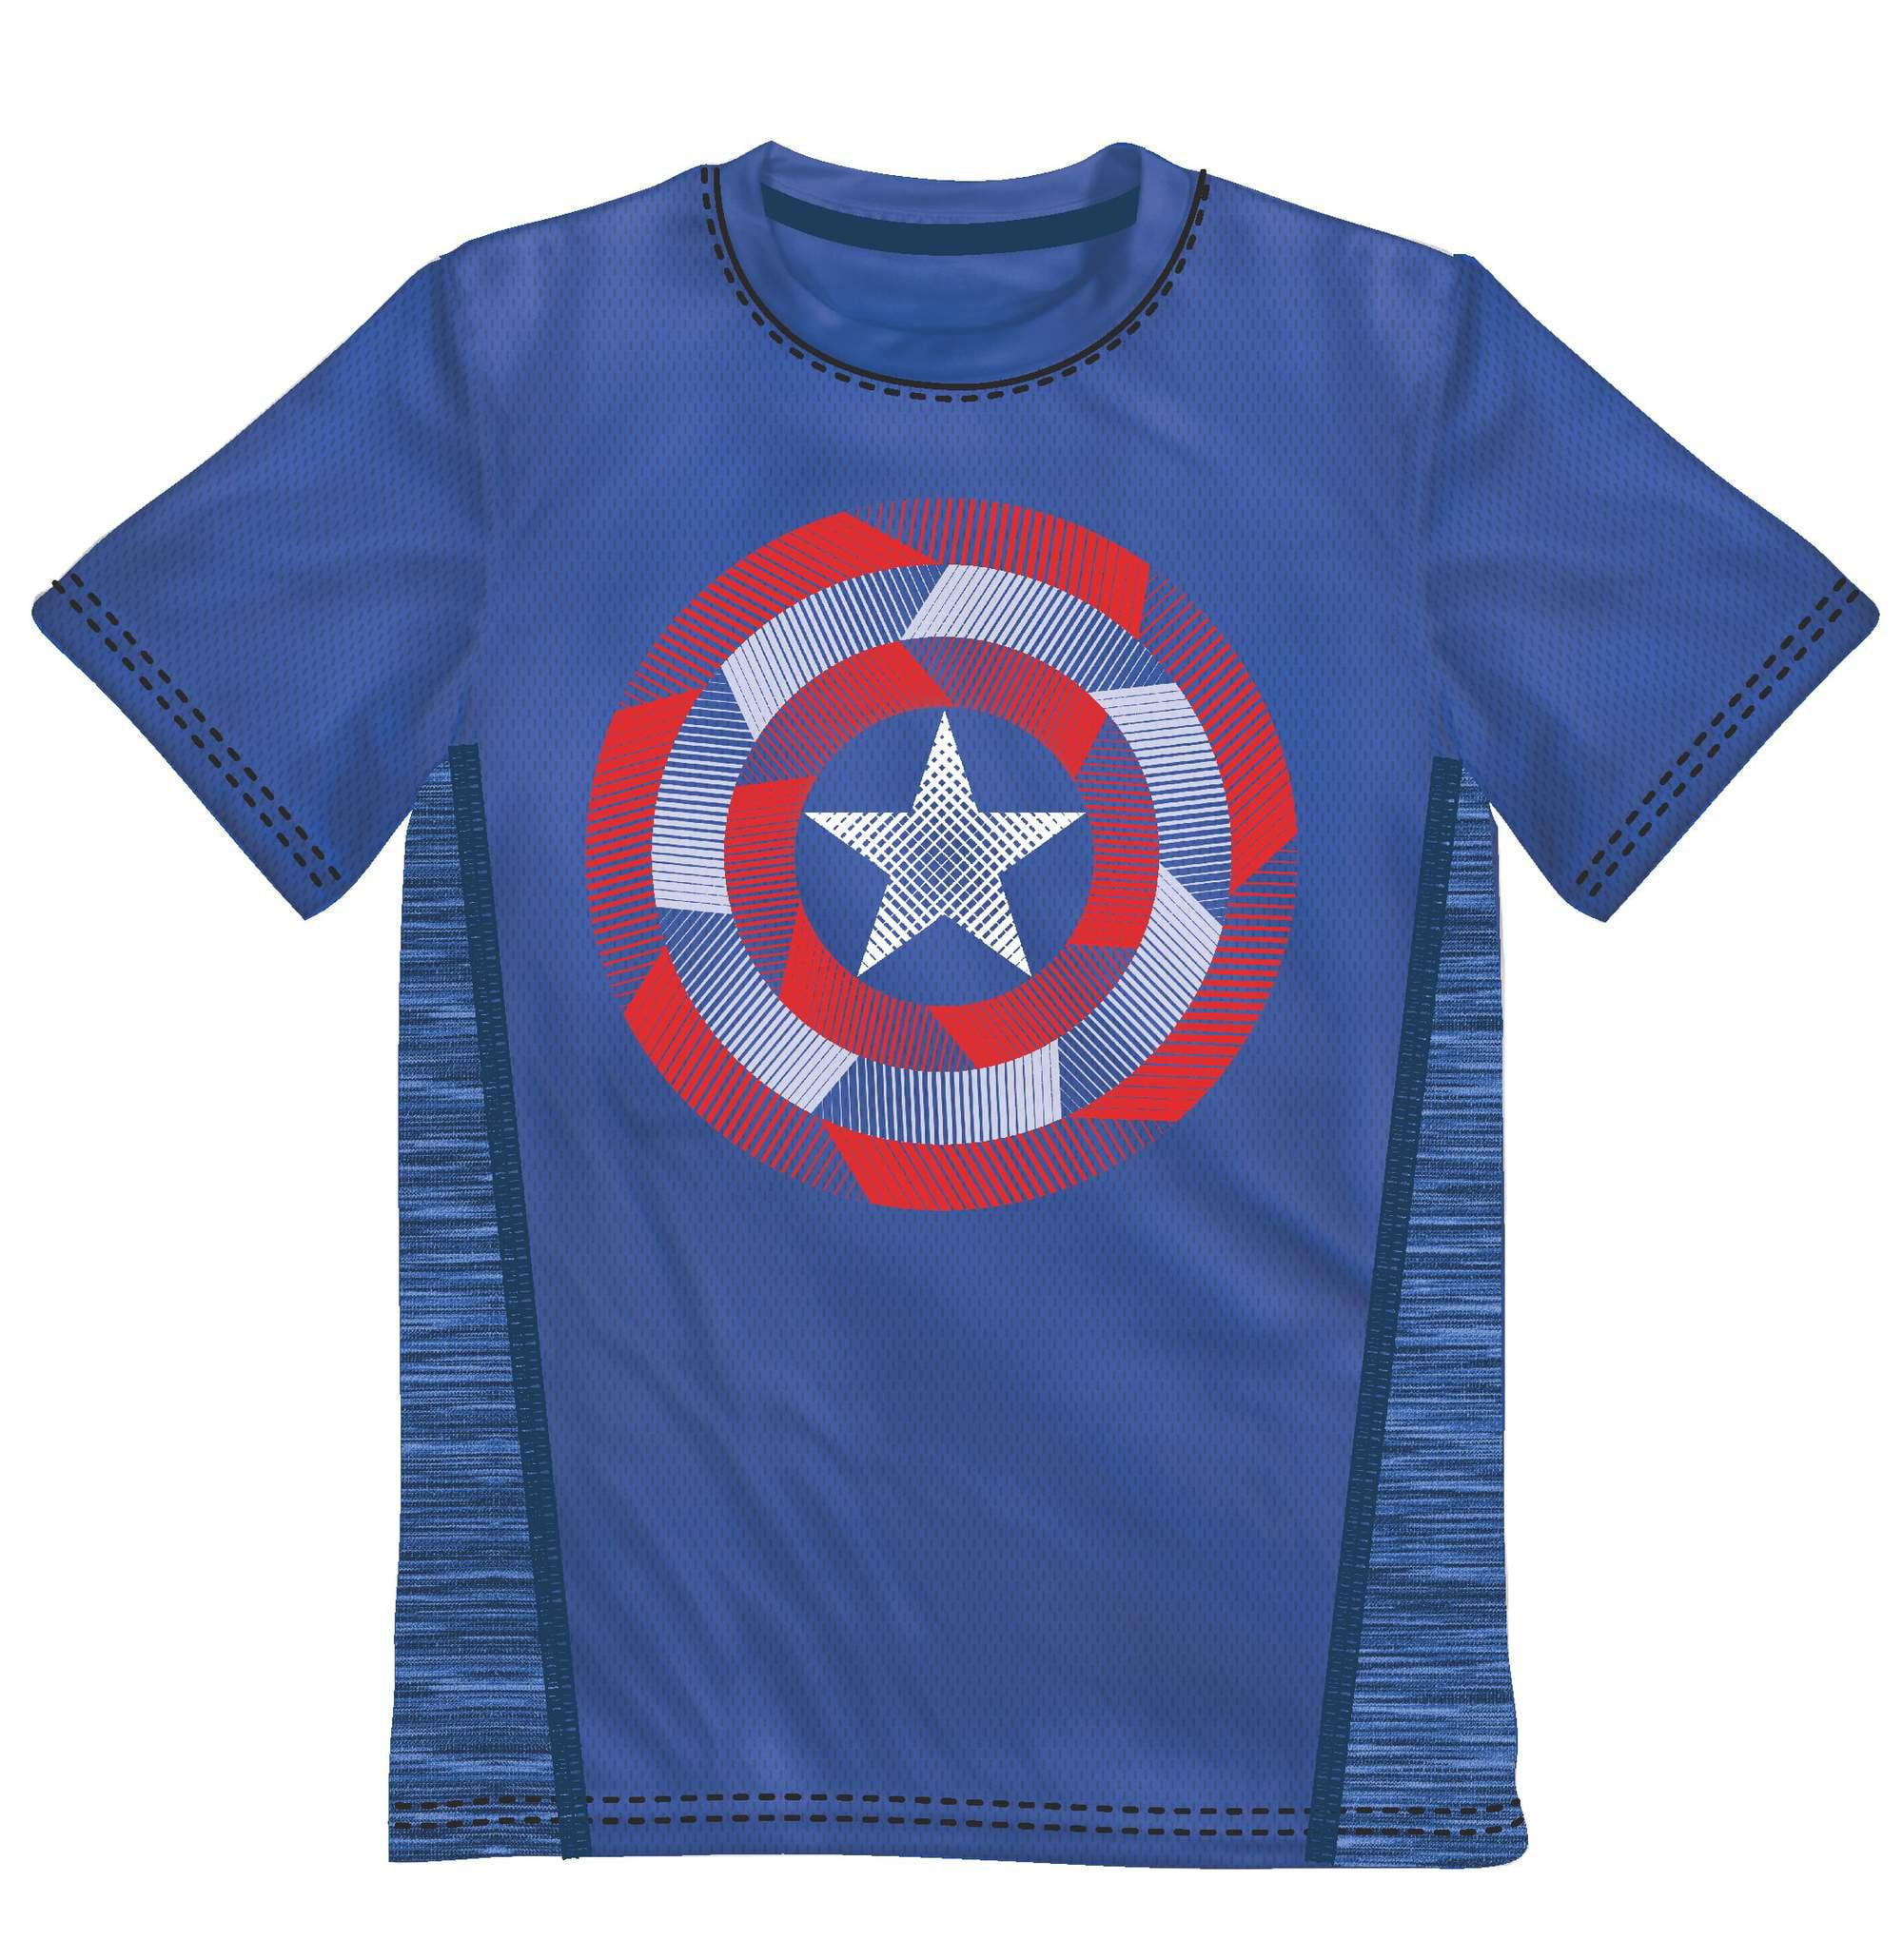 Boys' Active Poly T-shirt